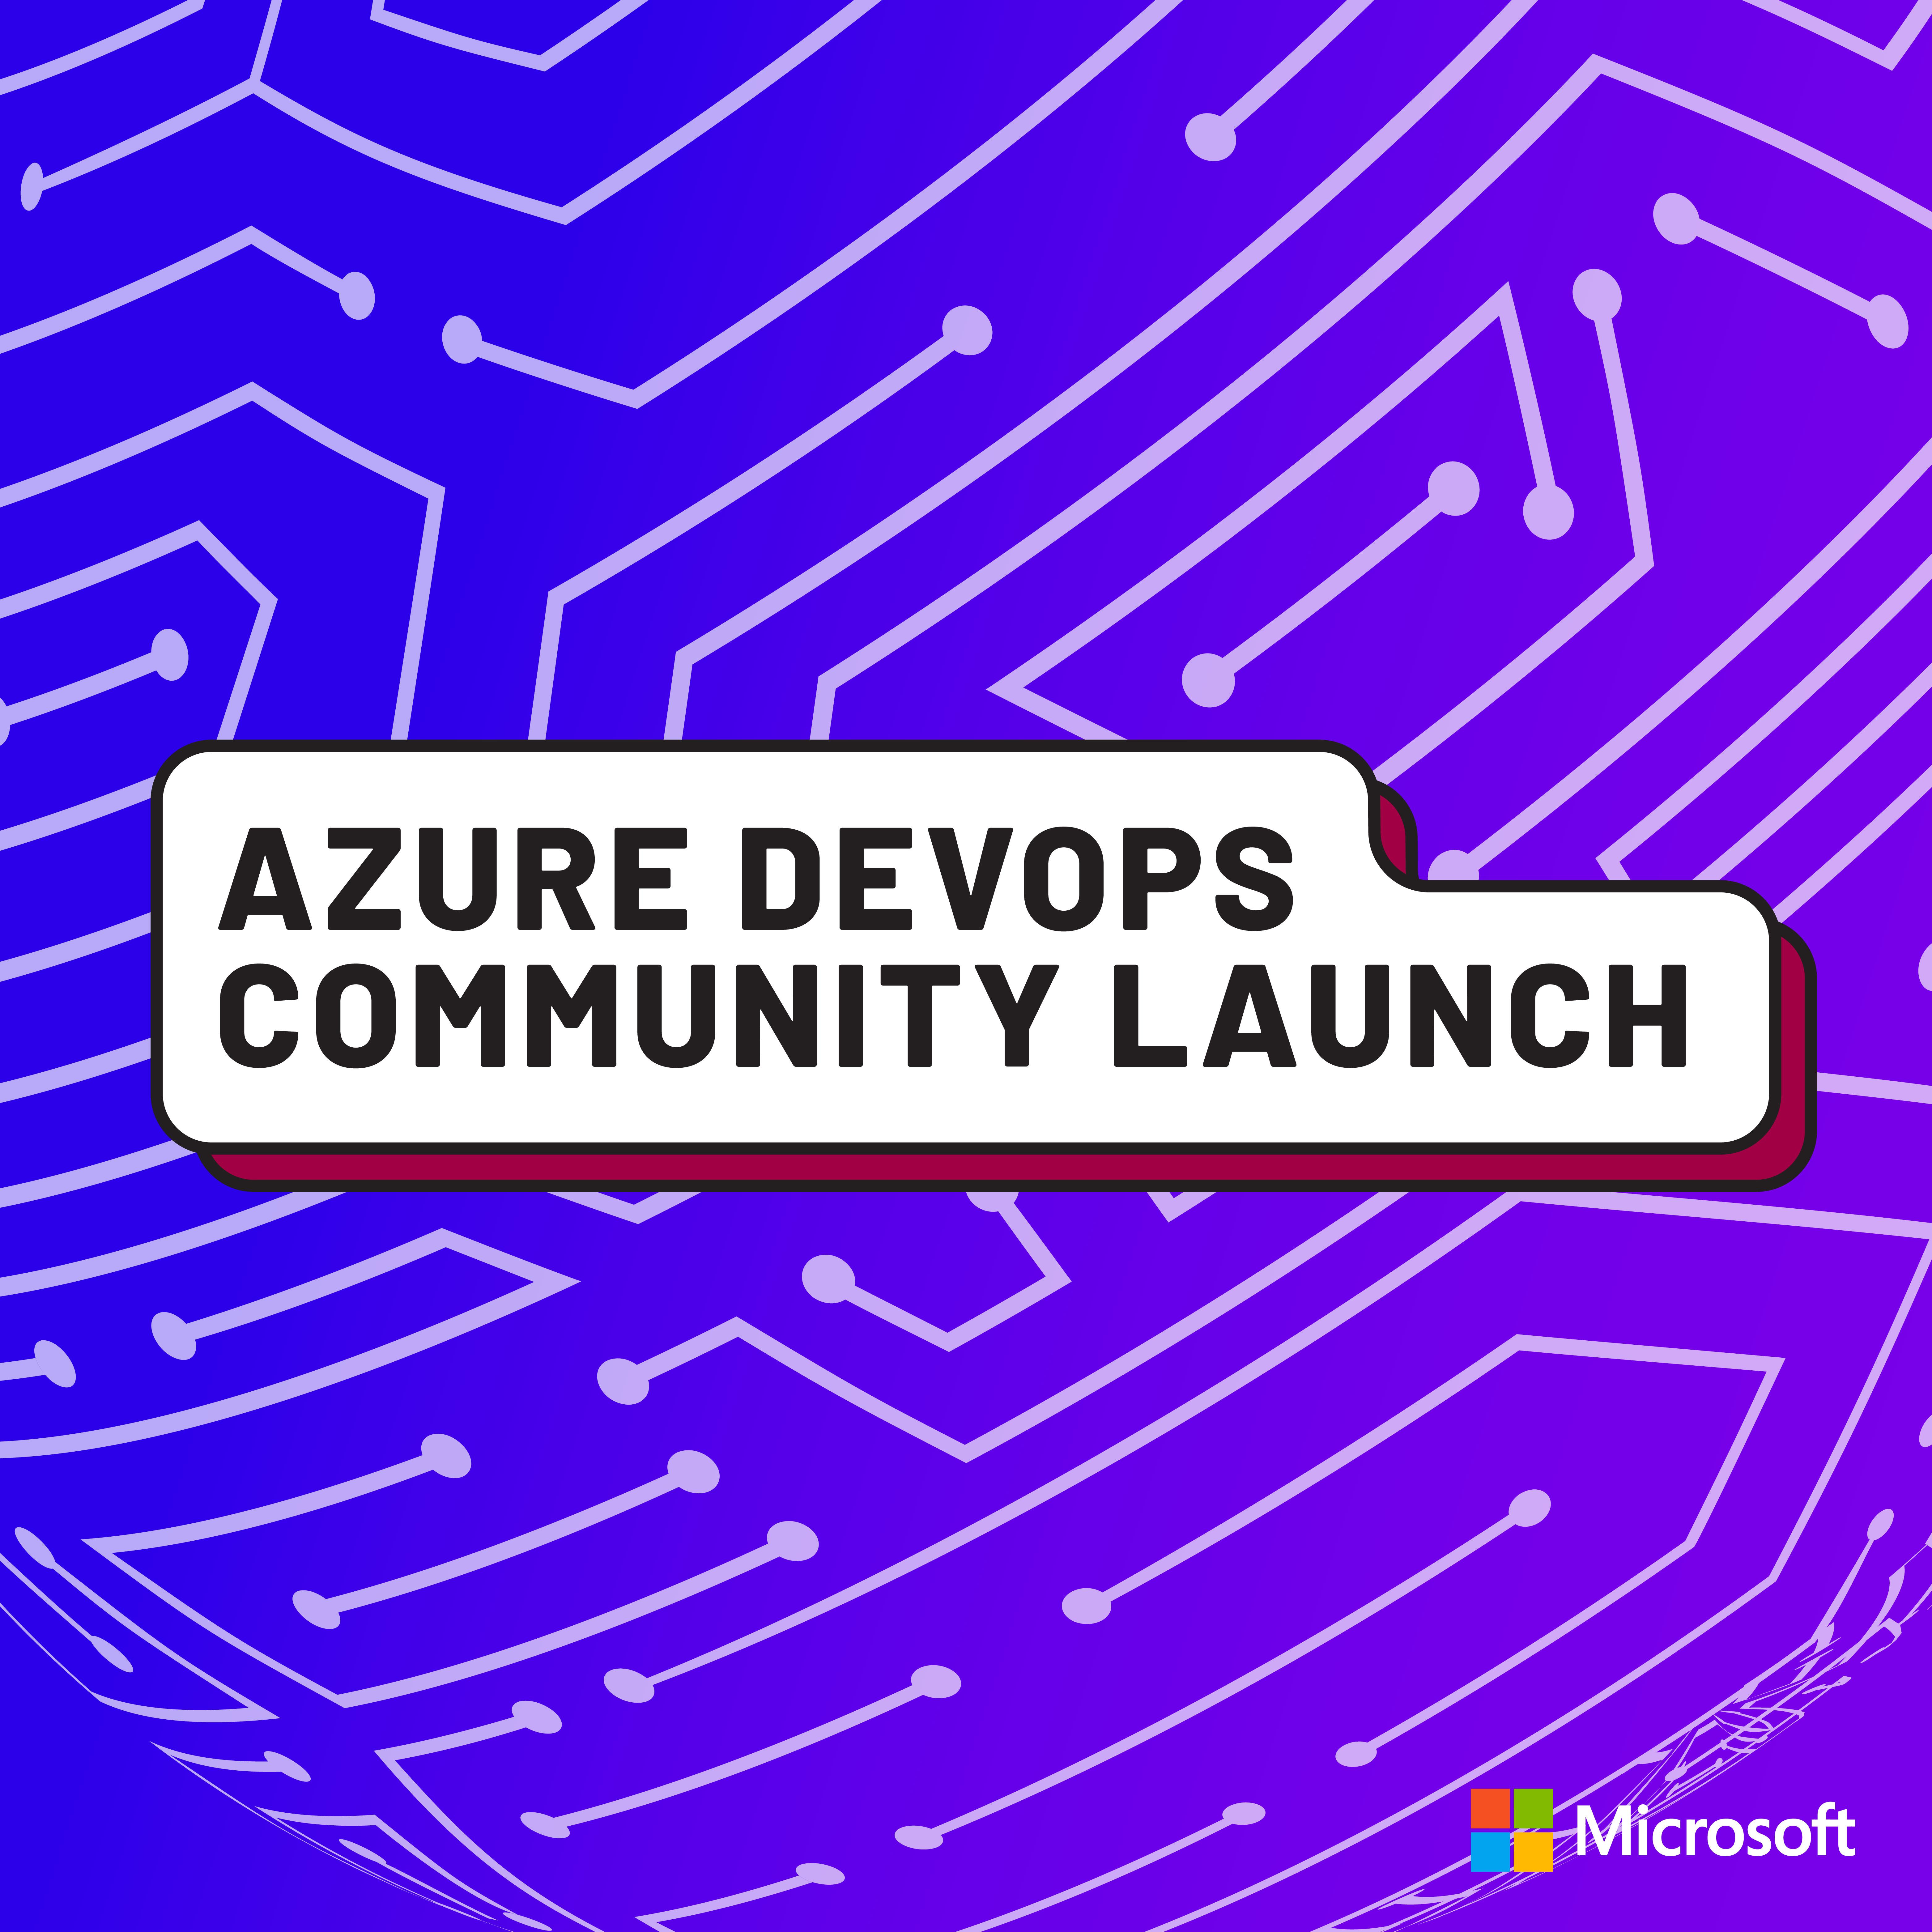 Azure DevOps Community Launch